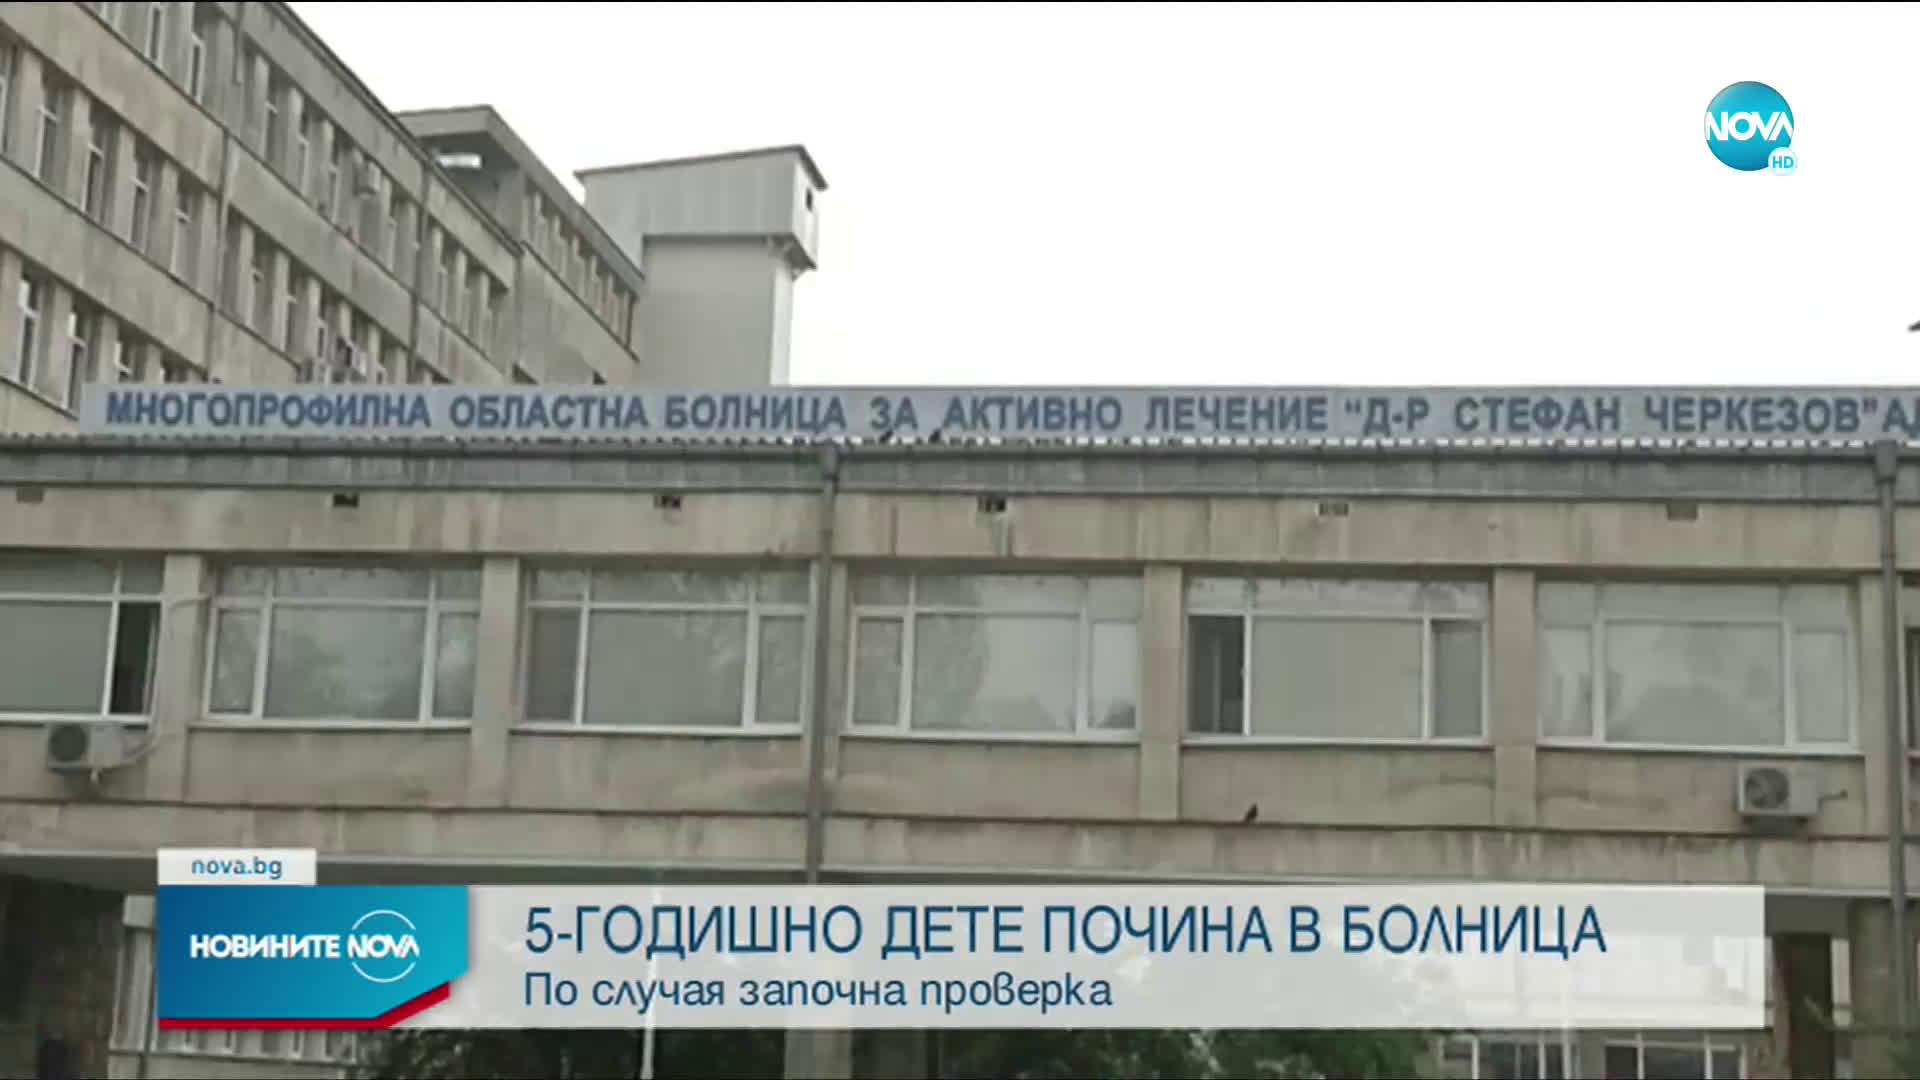 5-годишно дете почина в болница, задавило се с колбас